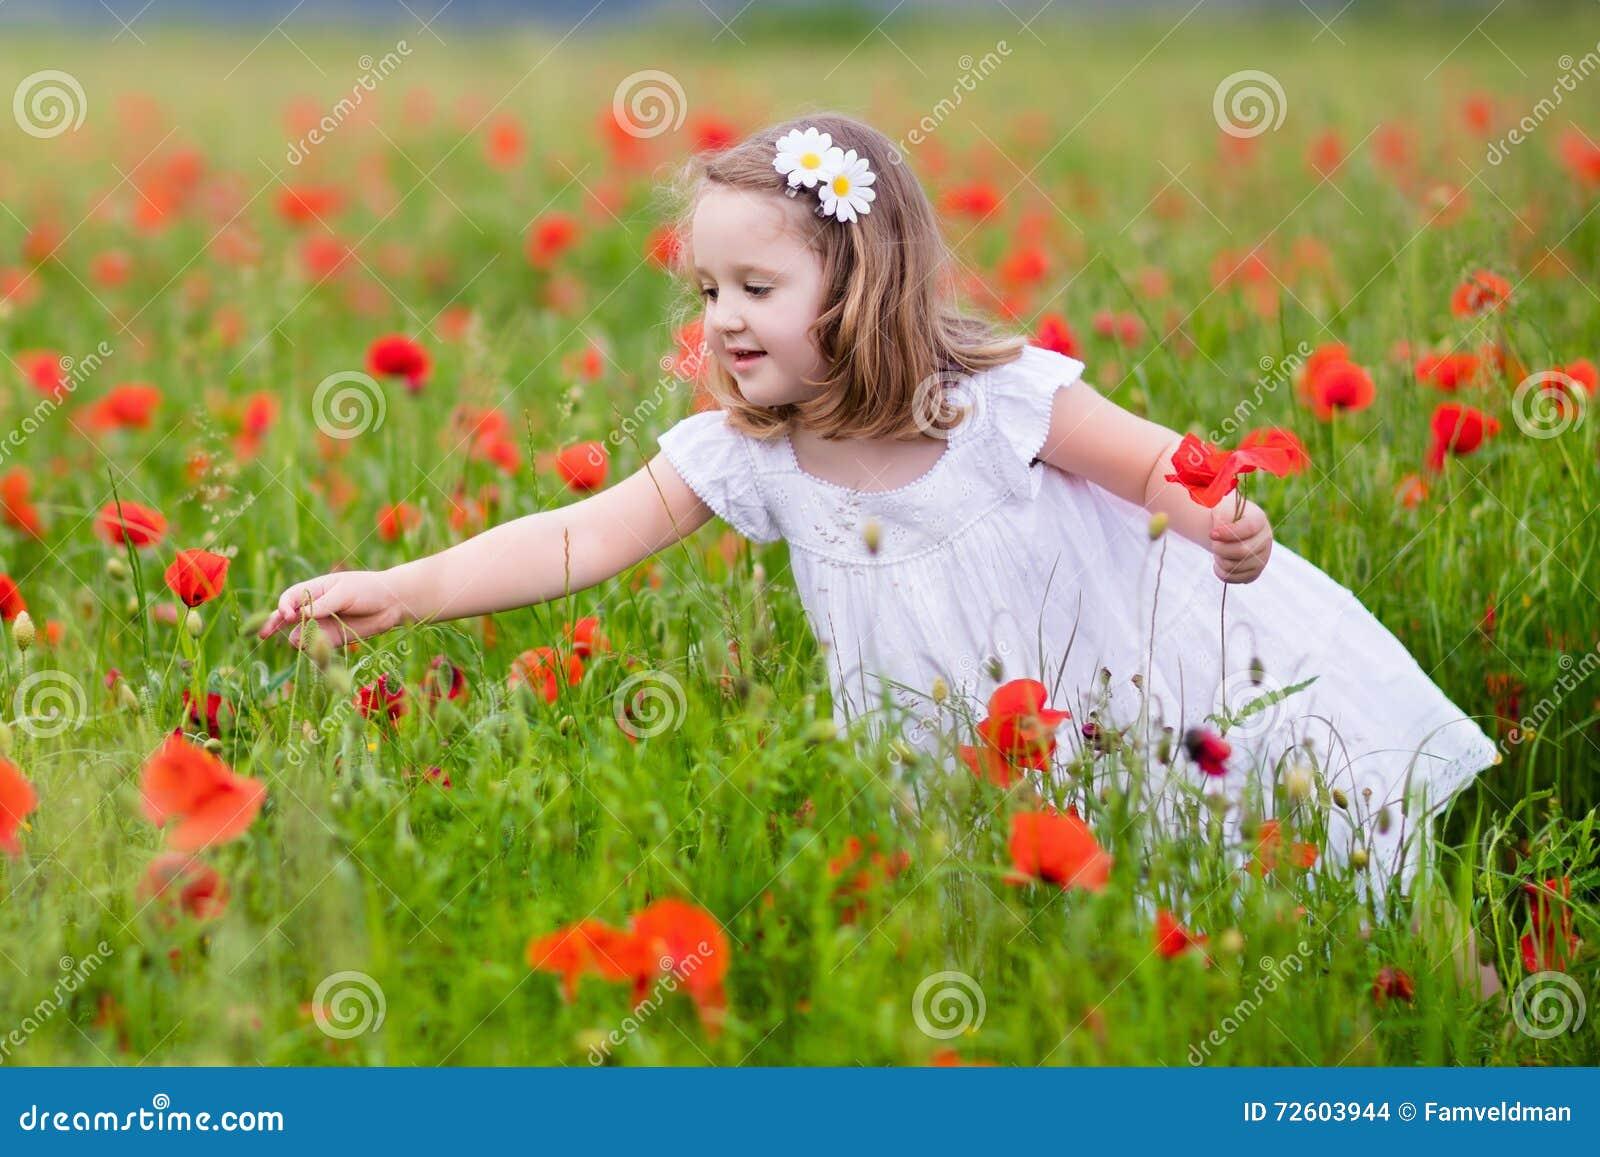 Little girl in poppy flower field stock photo image of agriculture download little girl in poppy flower field stock photo image of agriculture care mightylinksfo